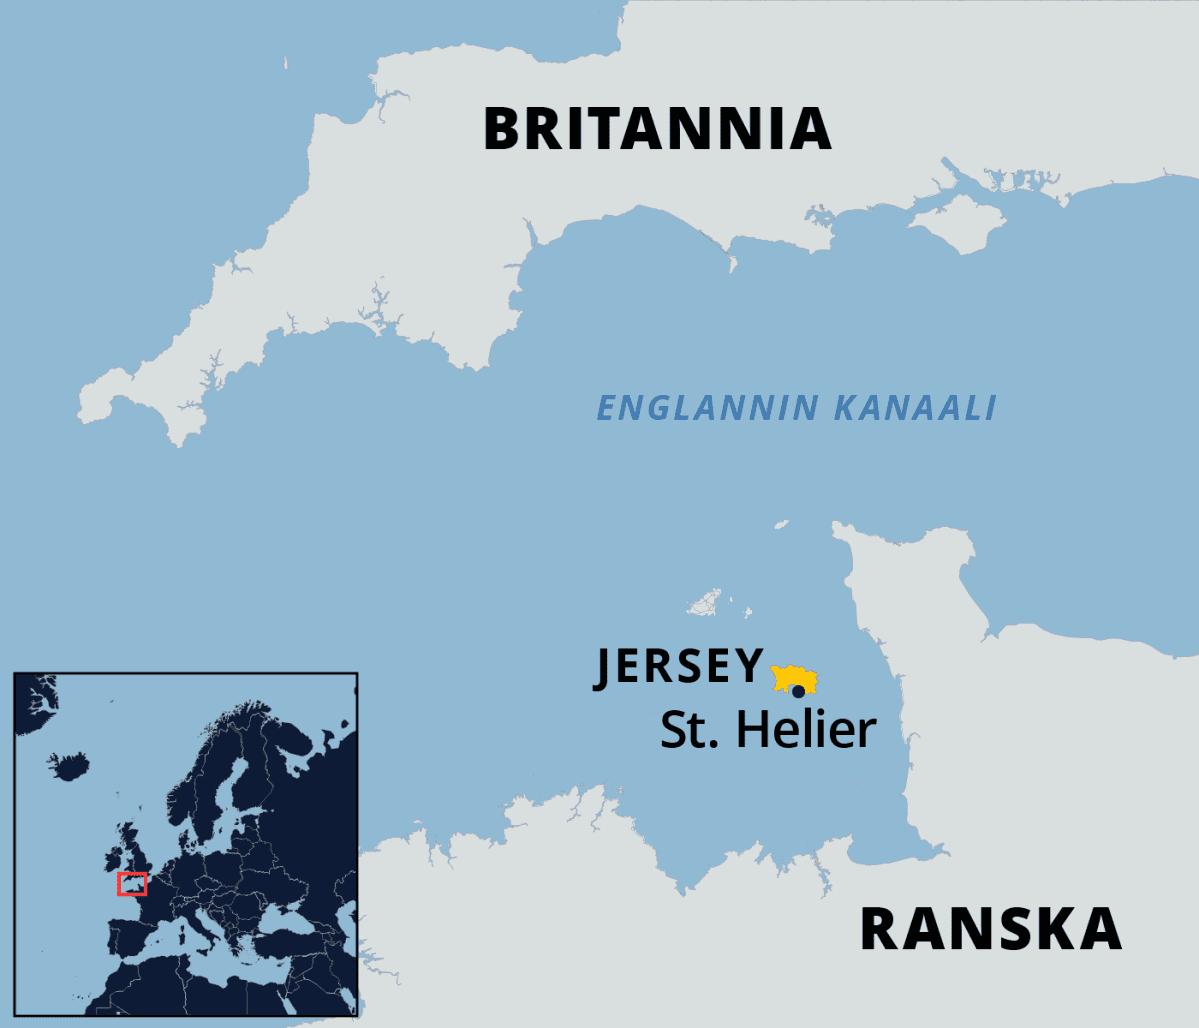 Kartalla jerseyn saari.